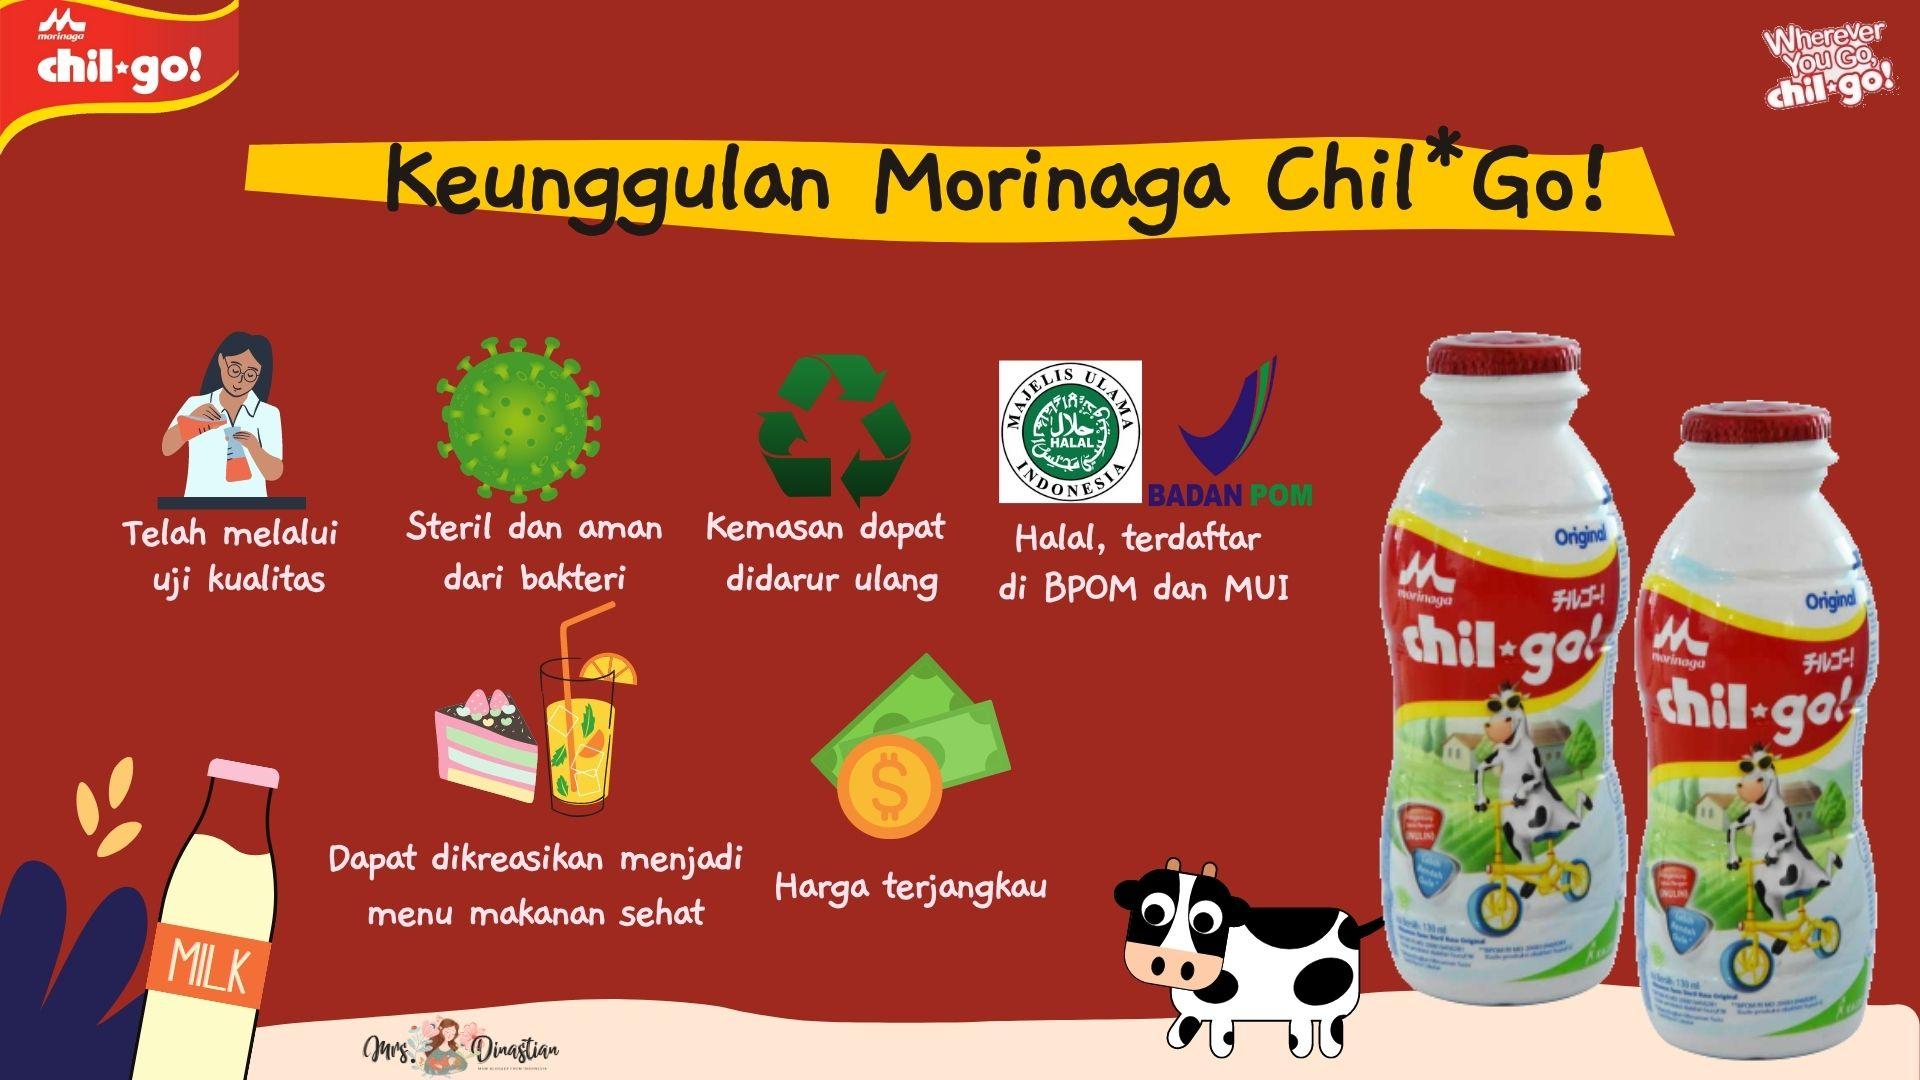 Keunggulan Morinaga Chil*Go!